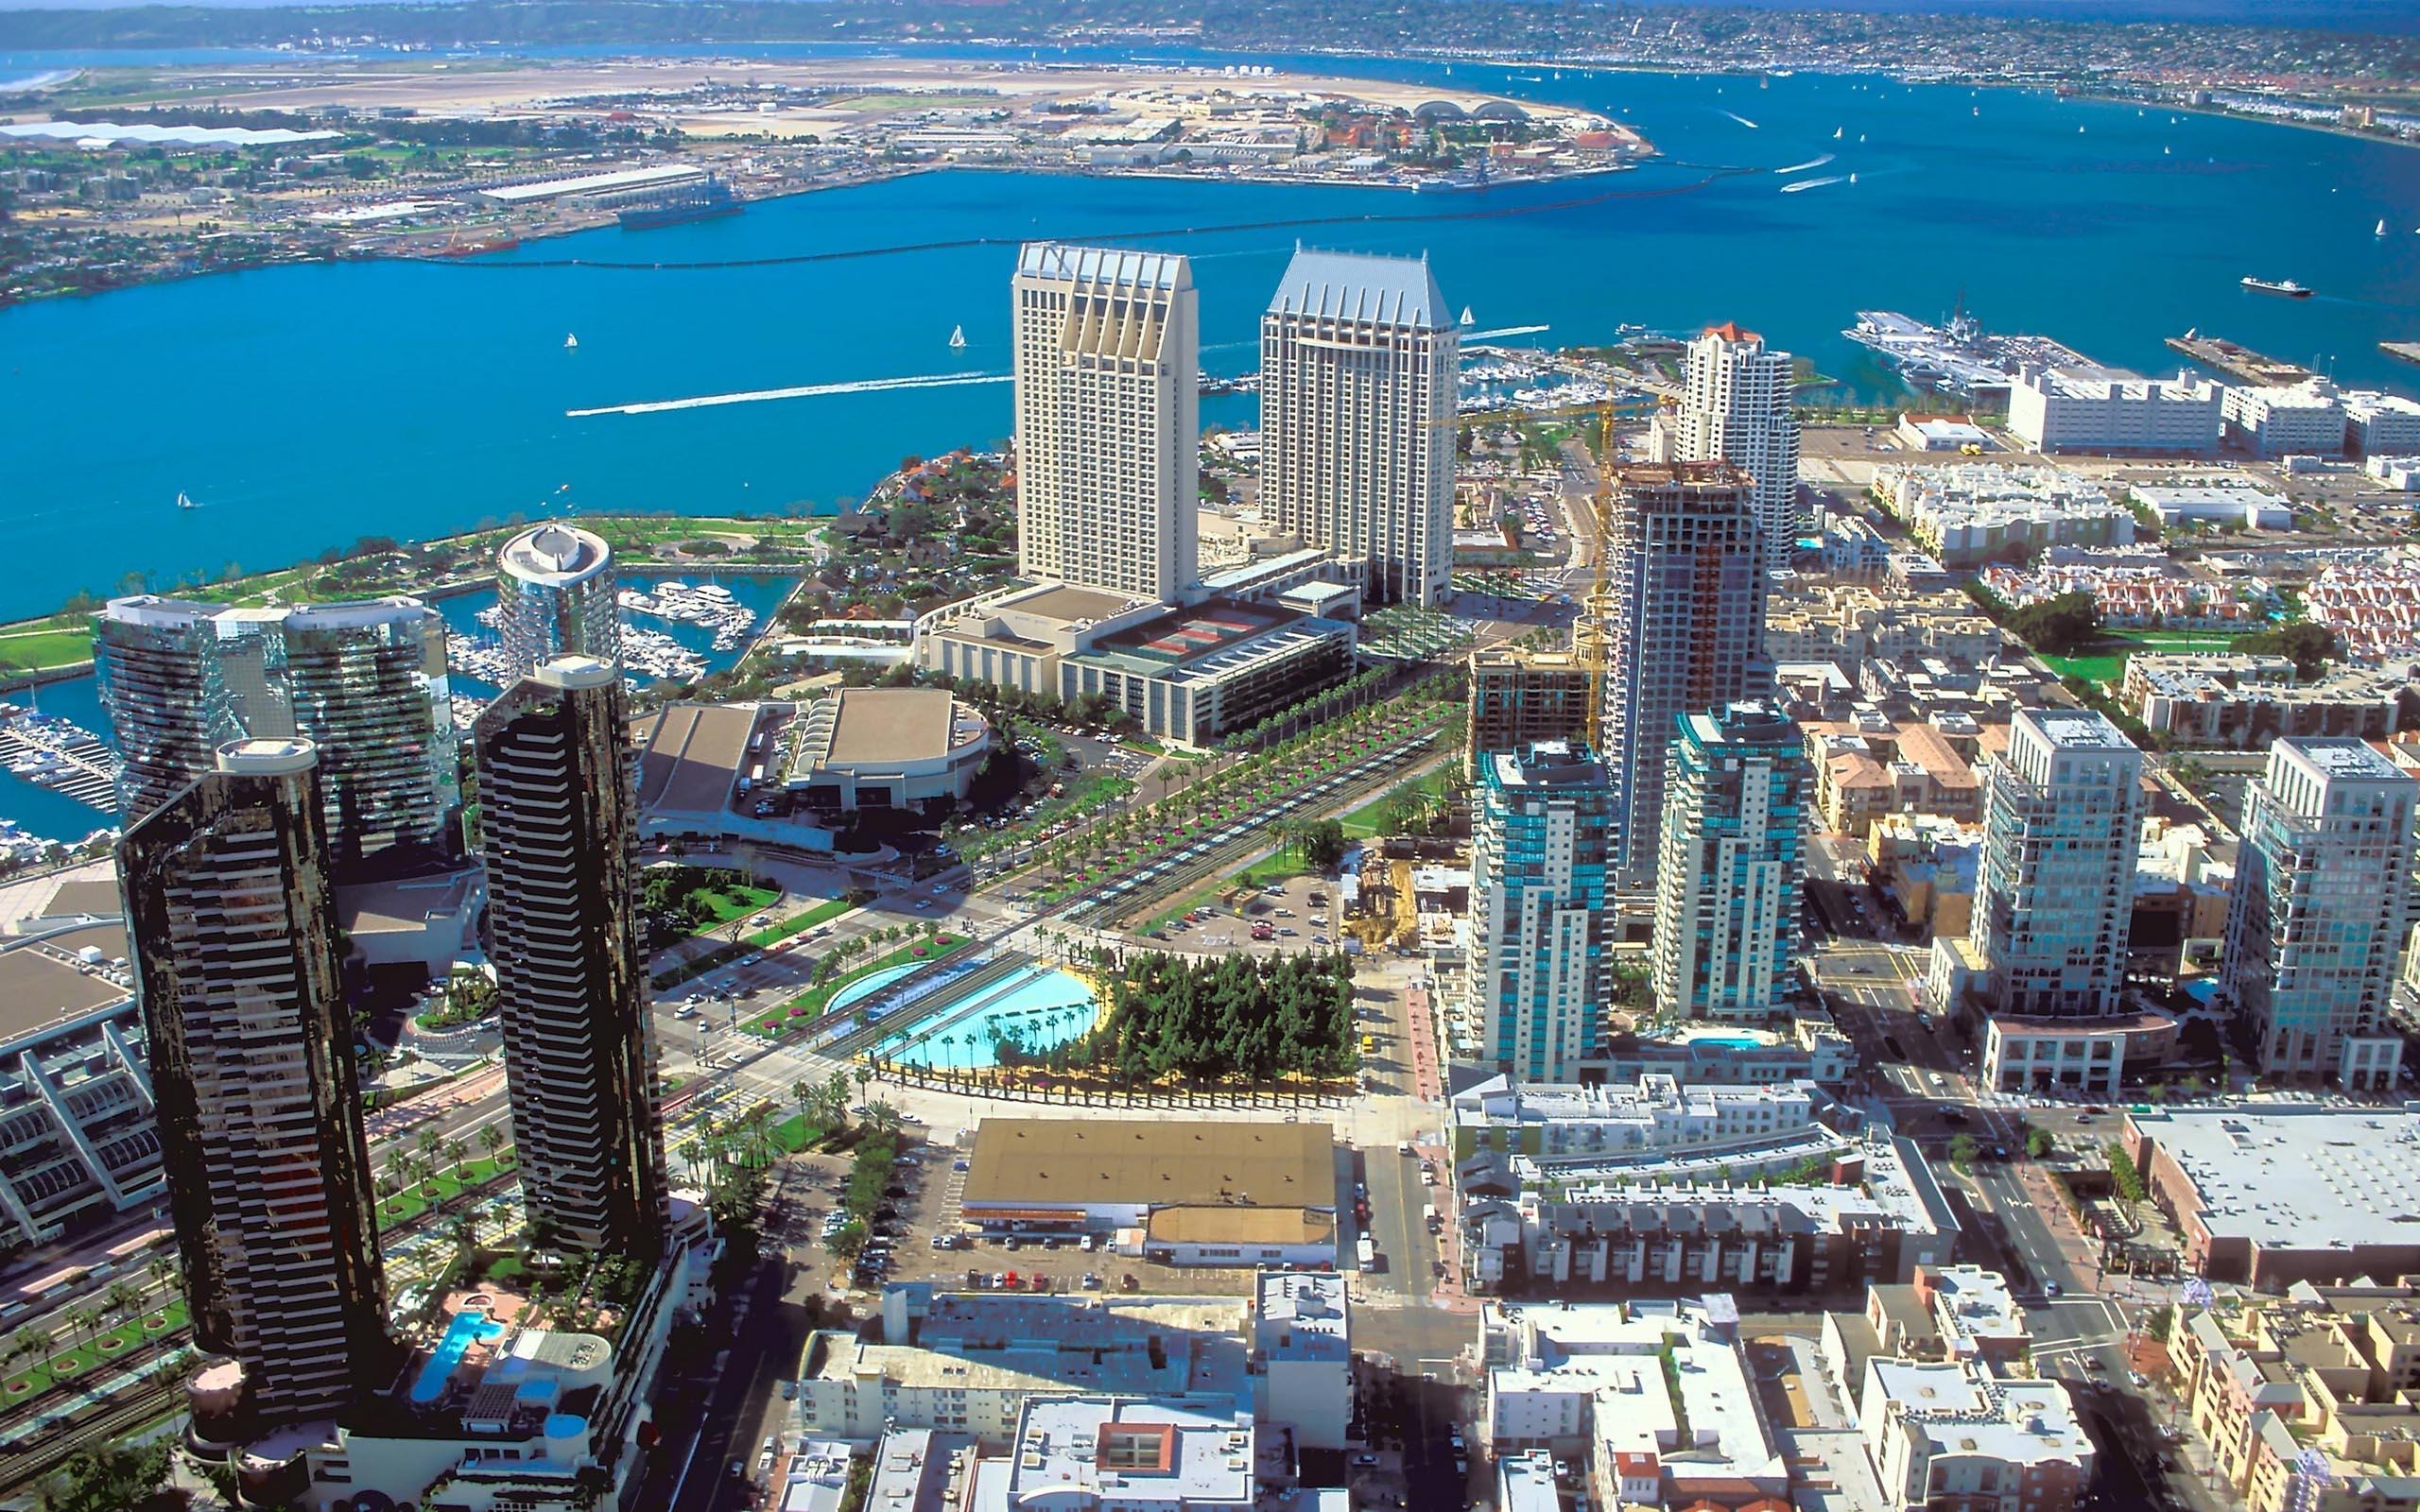 Wallpaper : San Diego, city center, top view, skyscrapers, California, USA  2560x1600 - 4kWallpaper - 662725 - HD Wallpapers - WallHere